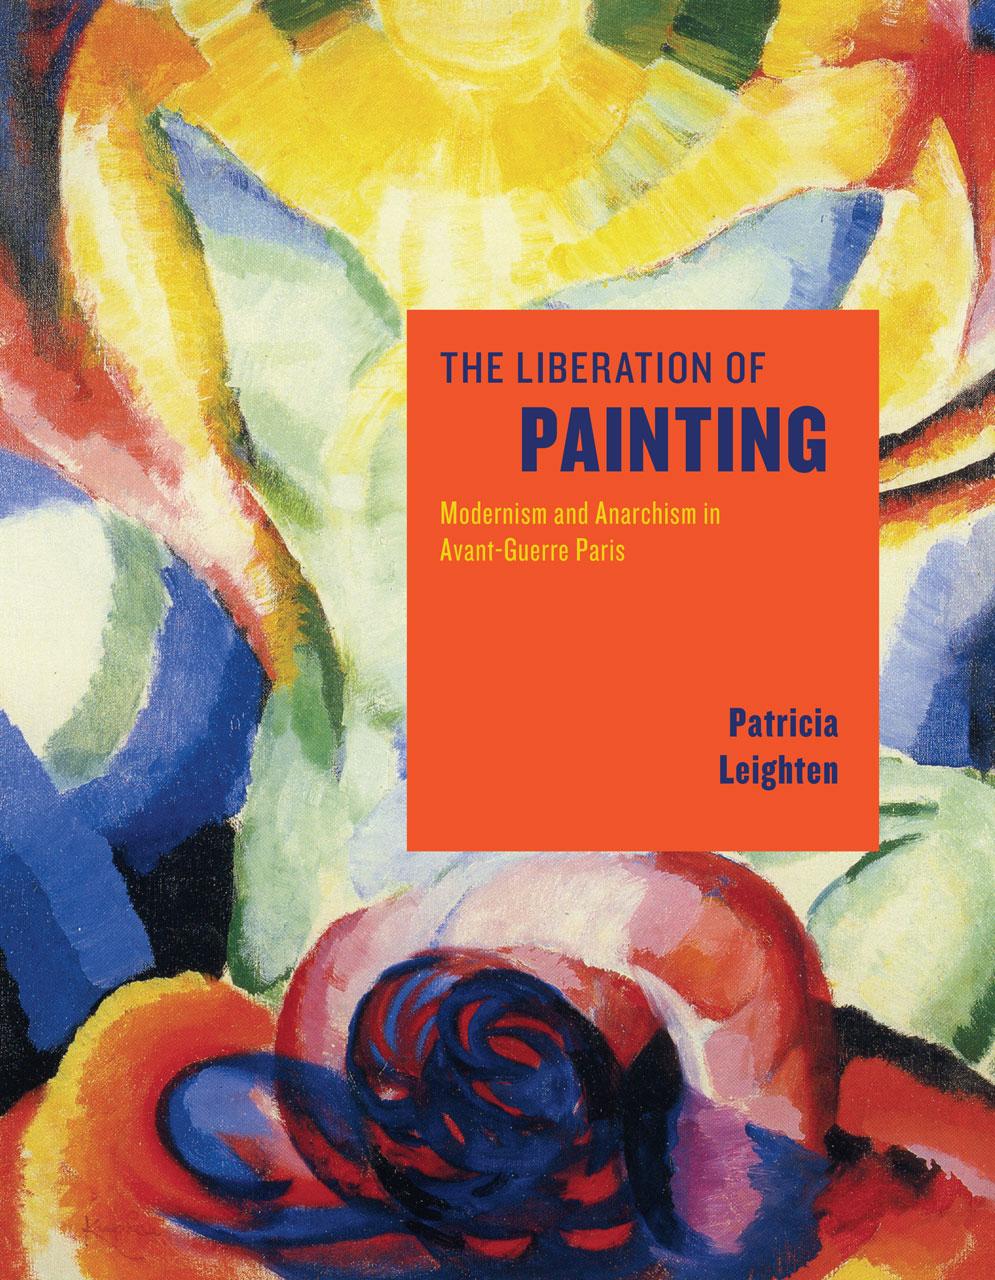 The Liberation of Painting - De Leesclub van Alles